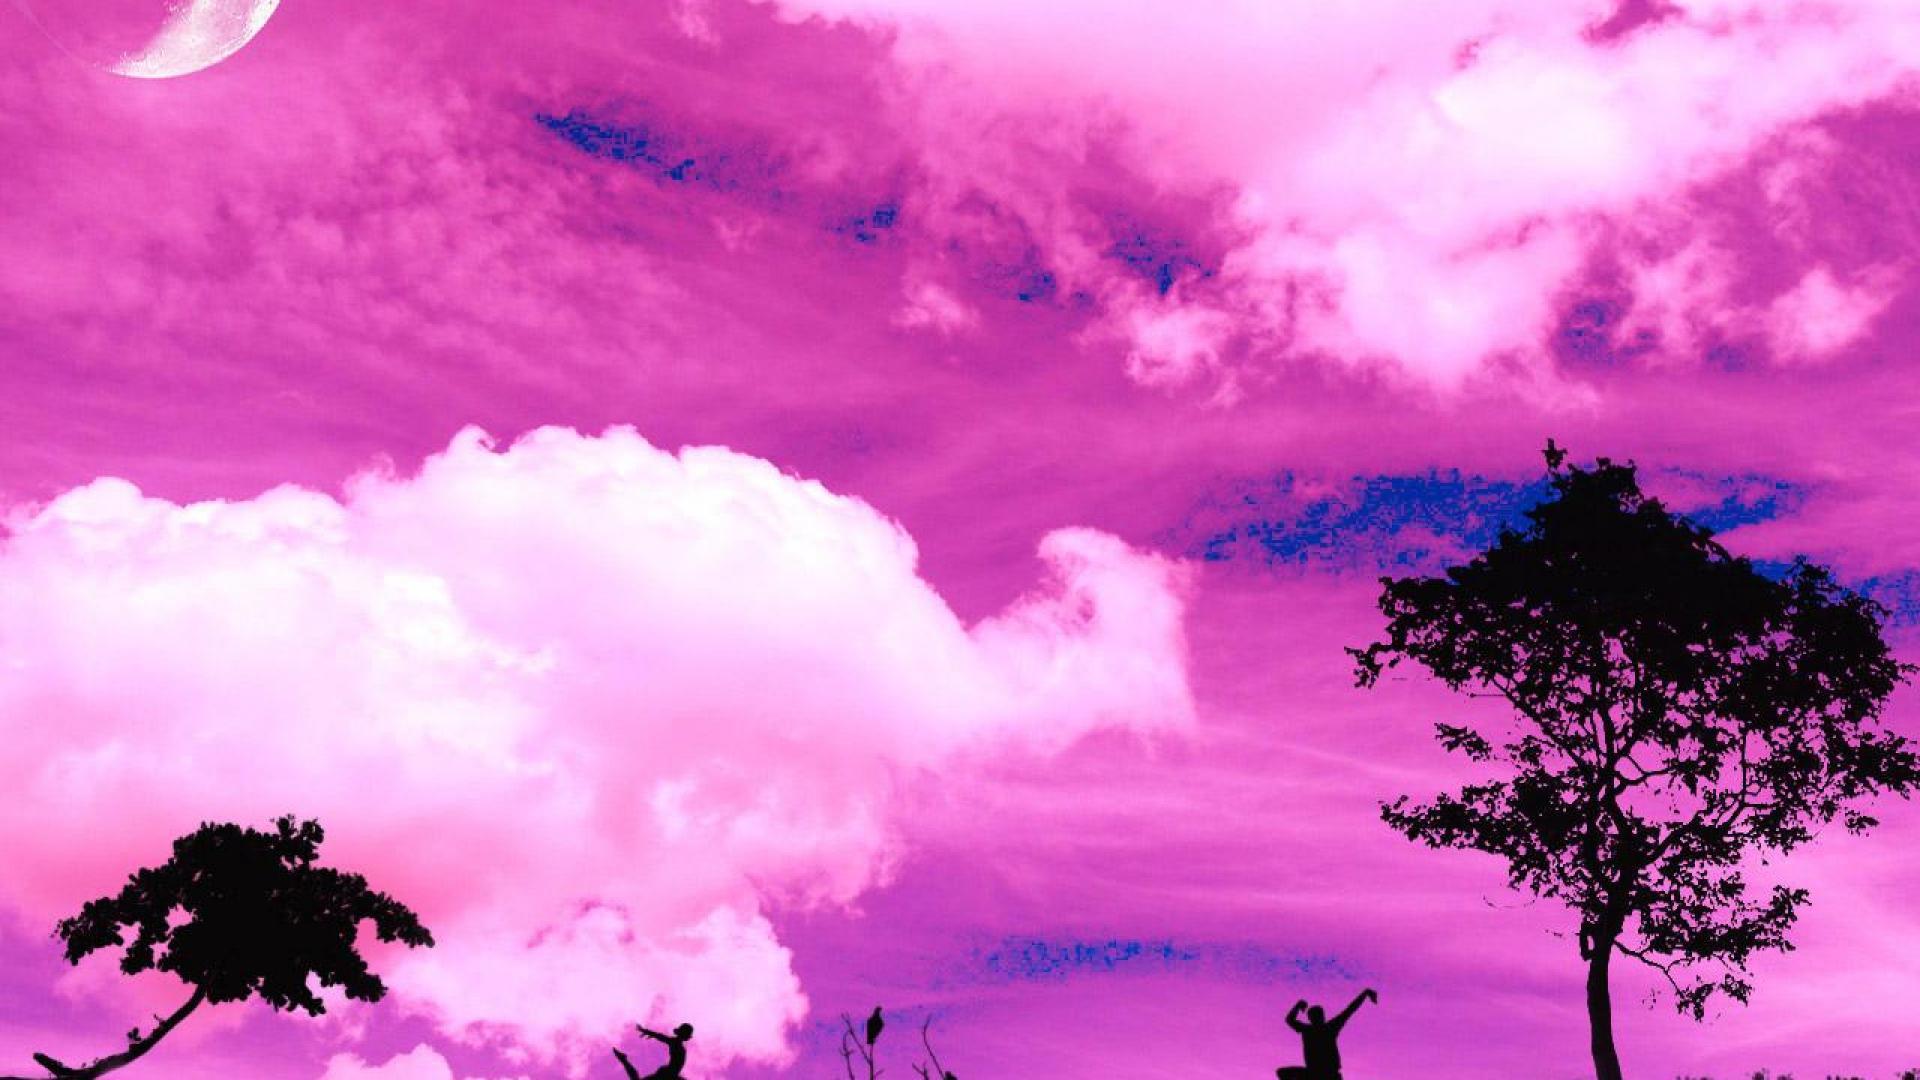 Love Pink Colour Wallpaper pink color desktop backgrounds   wallpaper 1920x1080